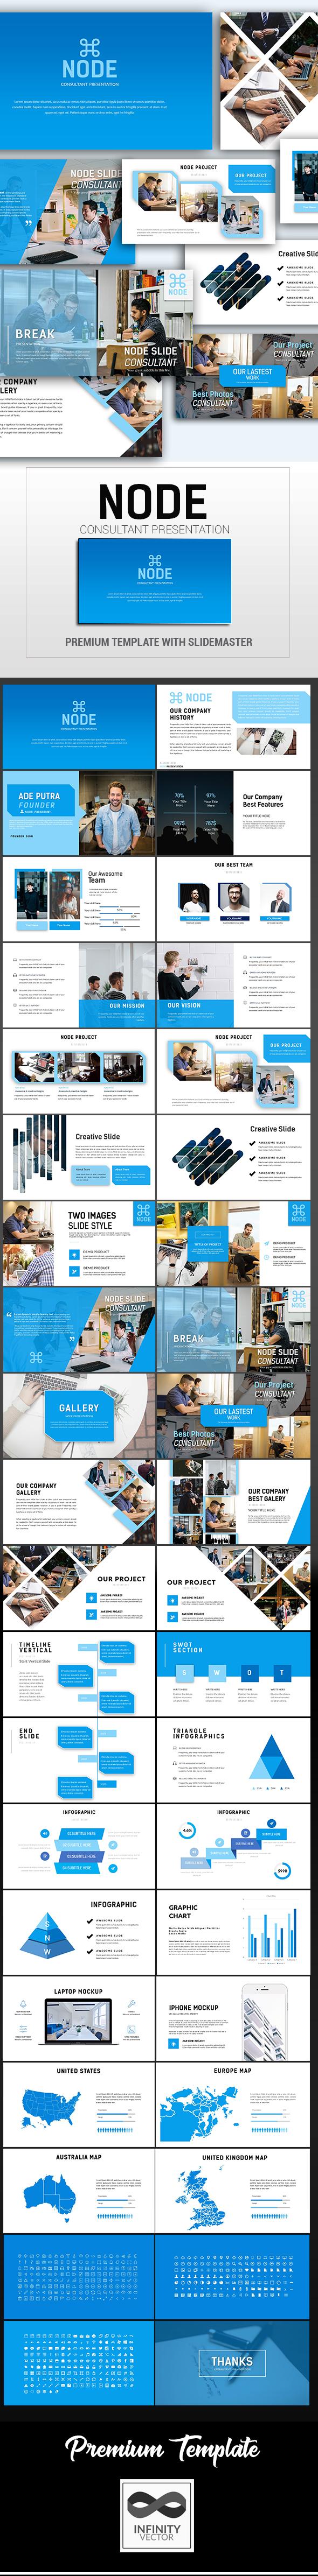 GraphicRiver Node Consultant Presentation Keynote 21146463